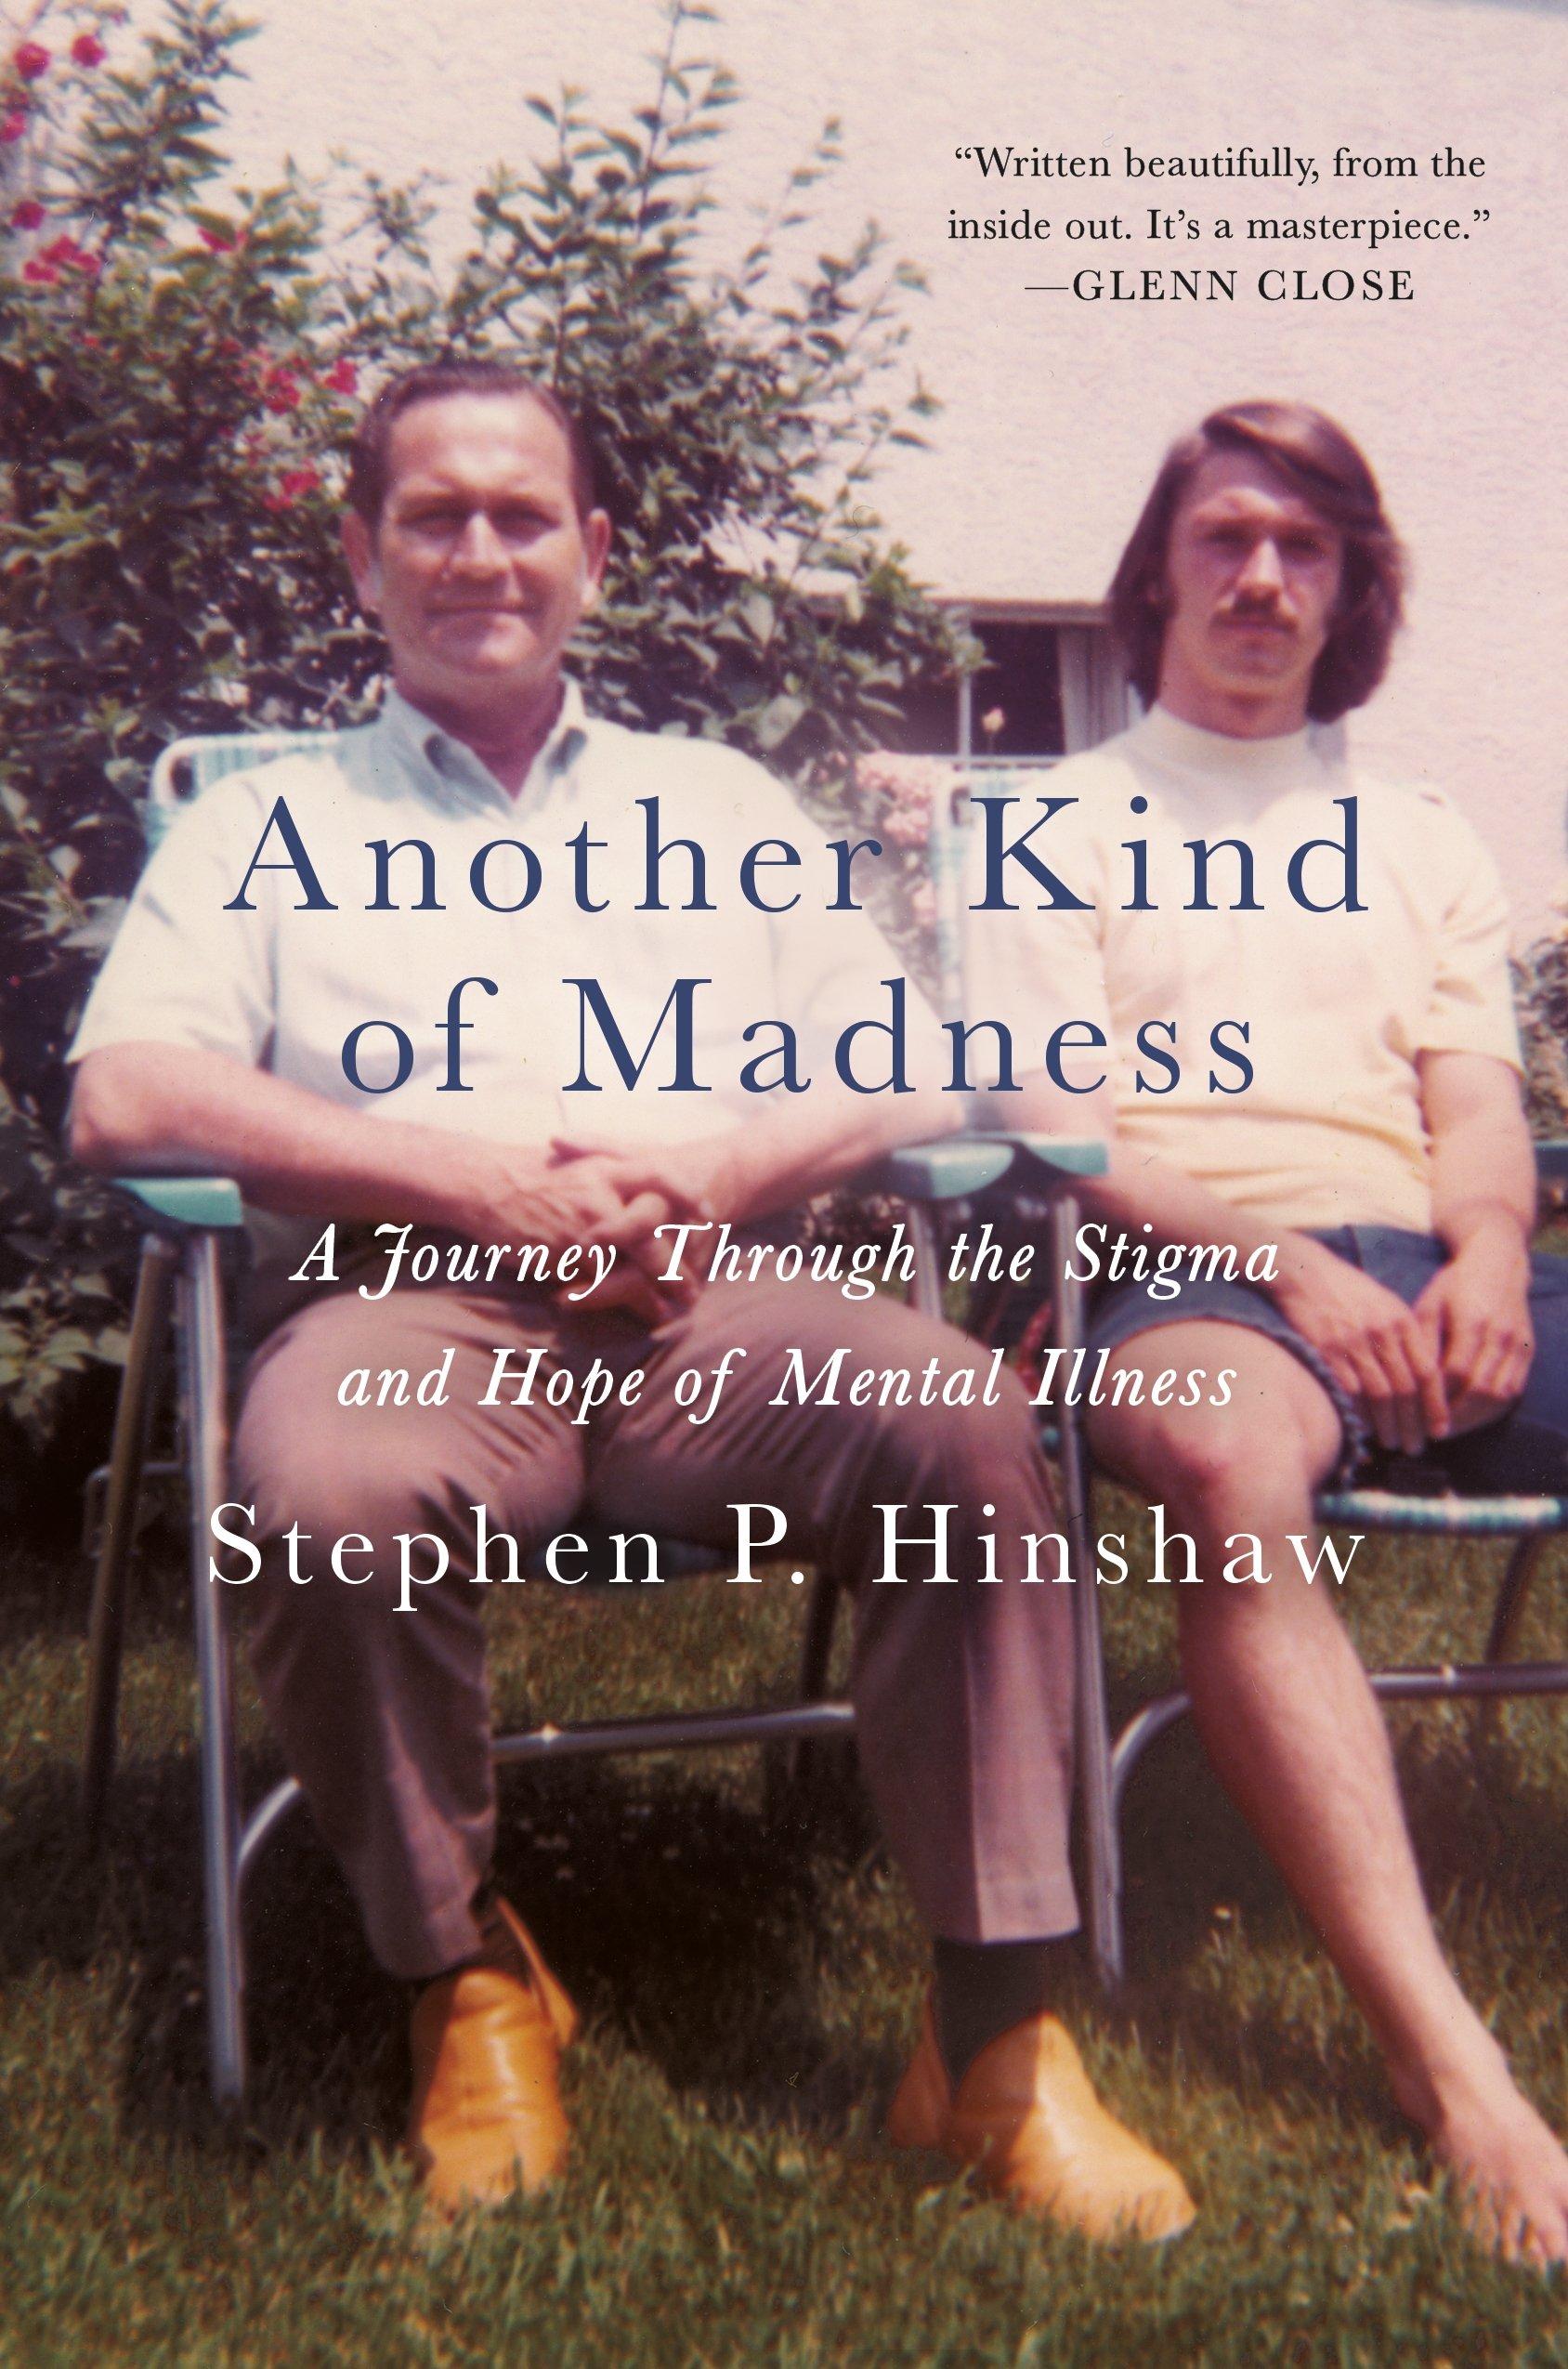 A Memoir by Dr. Stephen Hinshaw